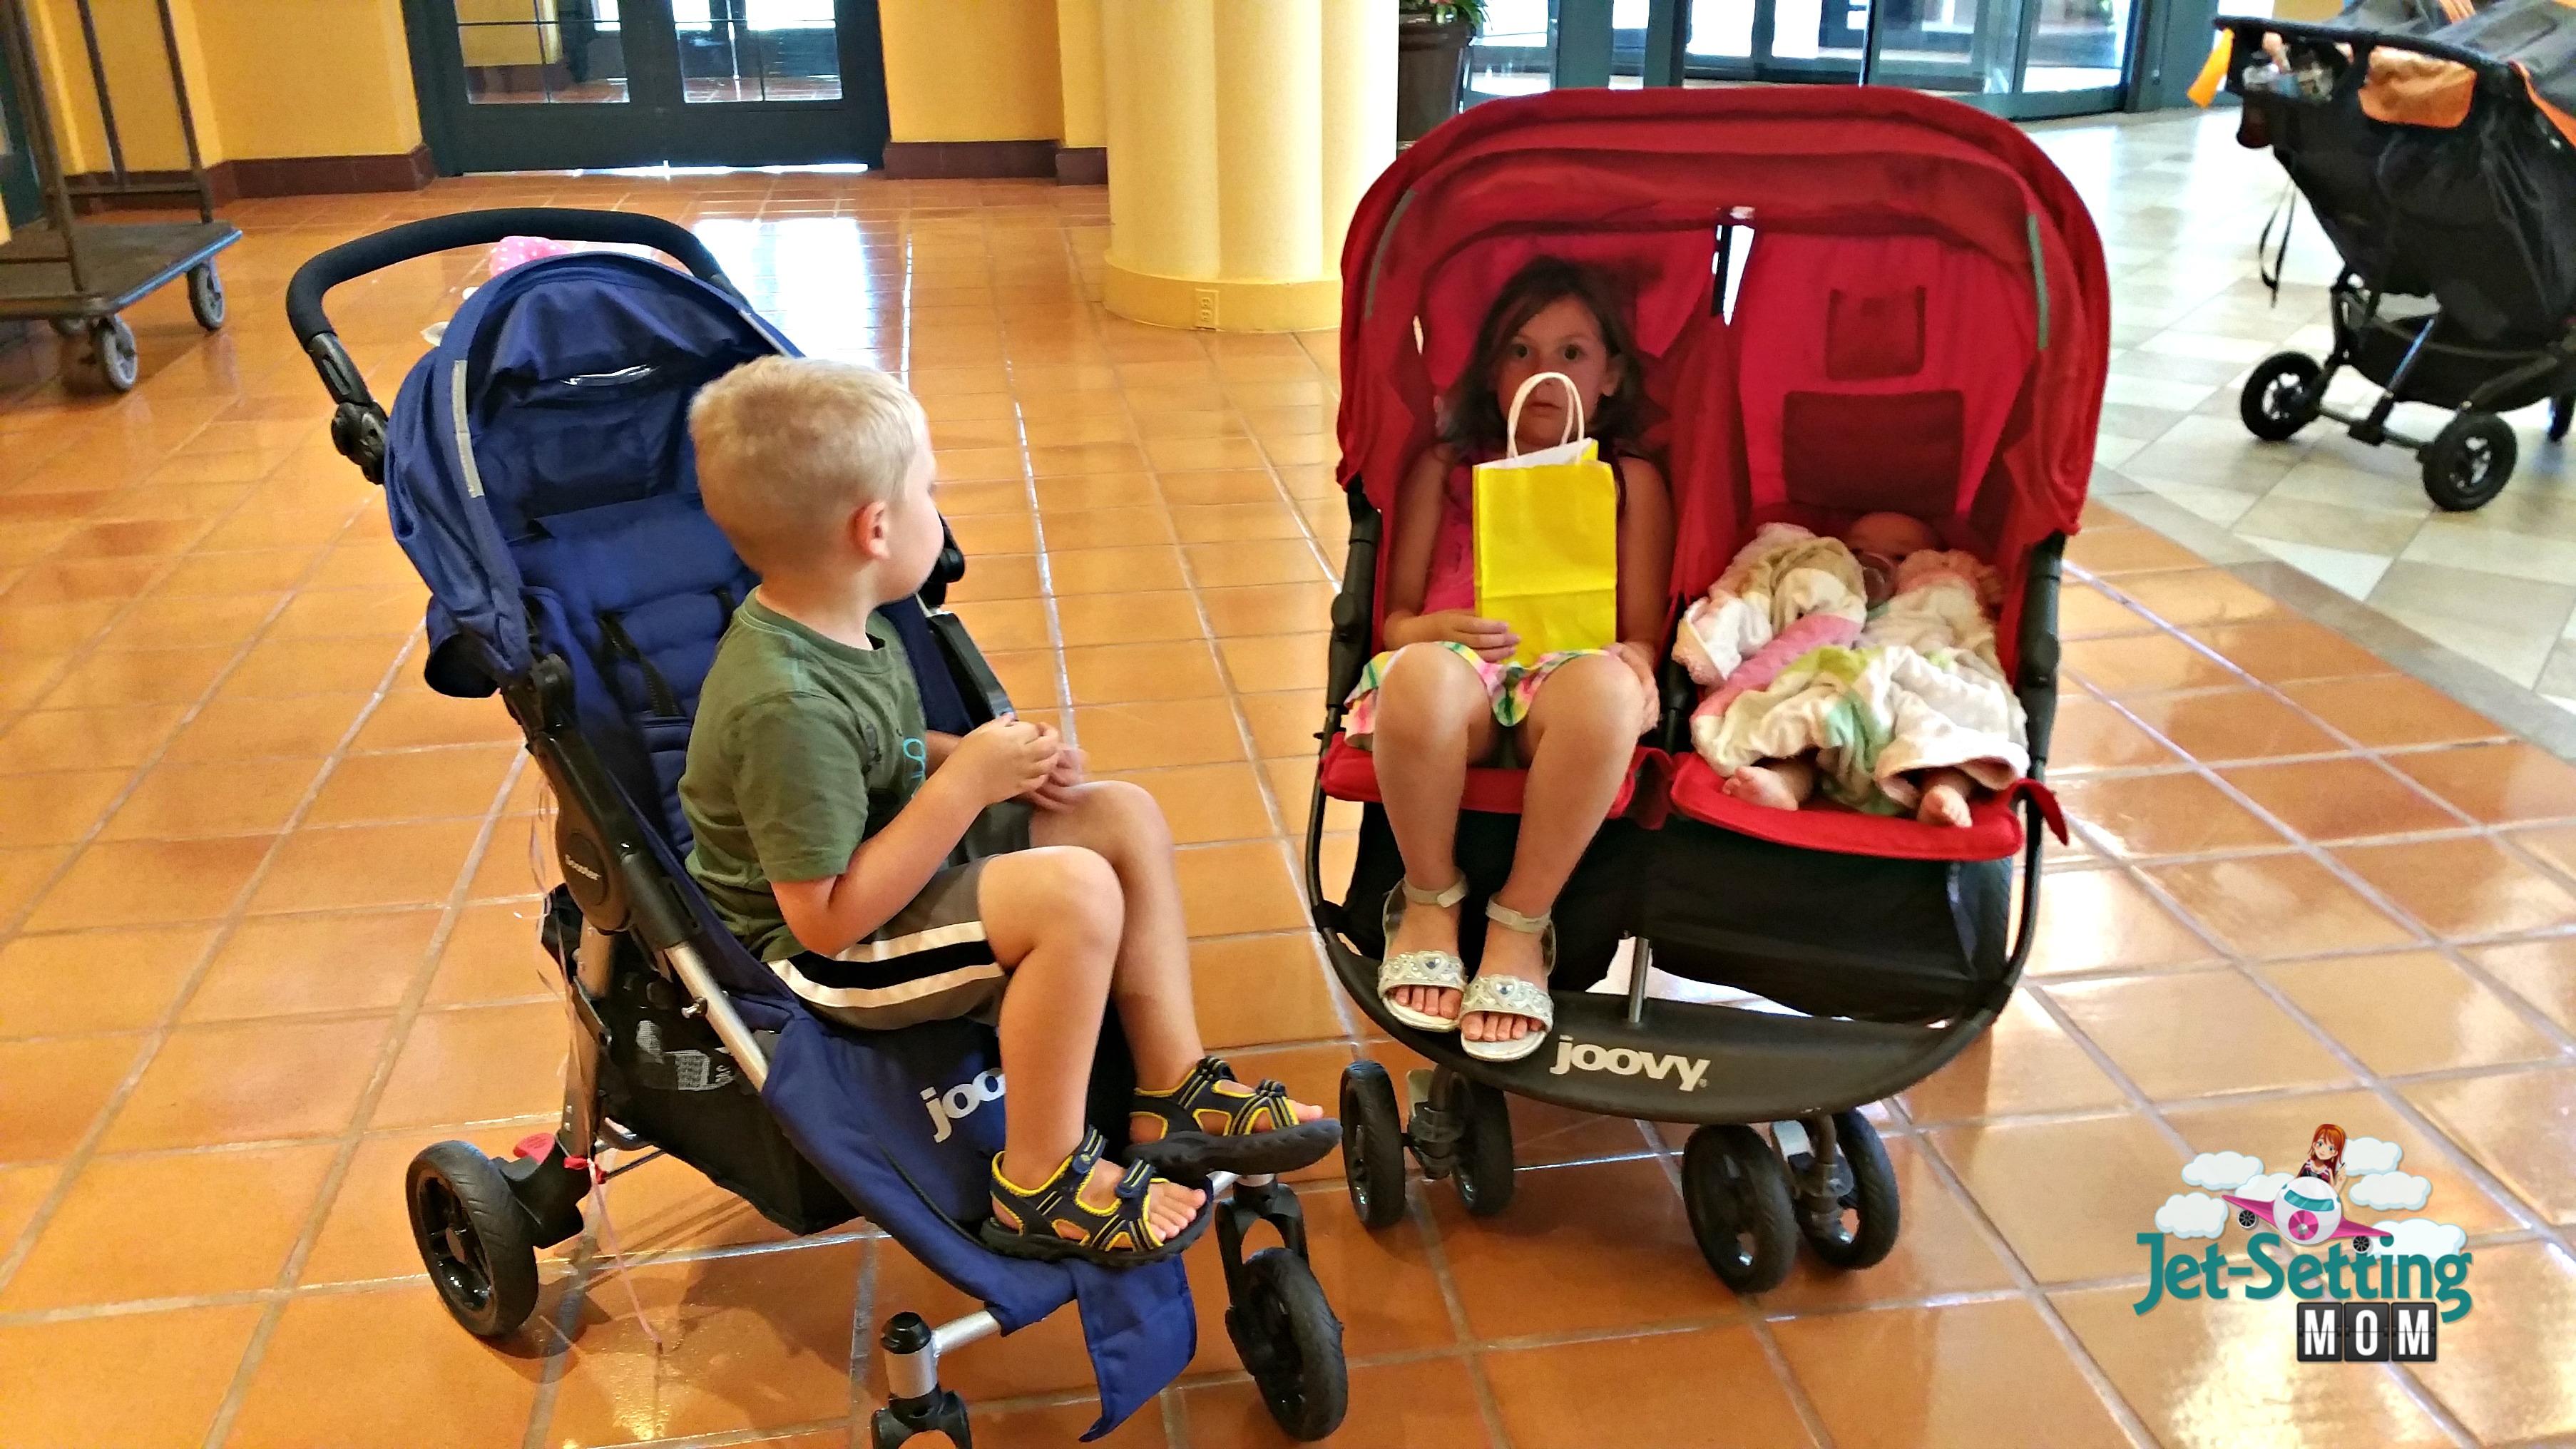 always bring a stroller to Disney!